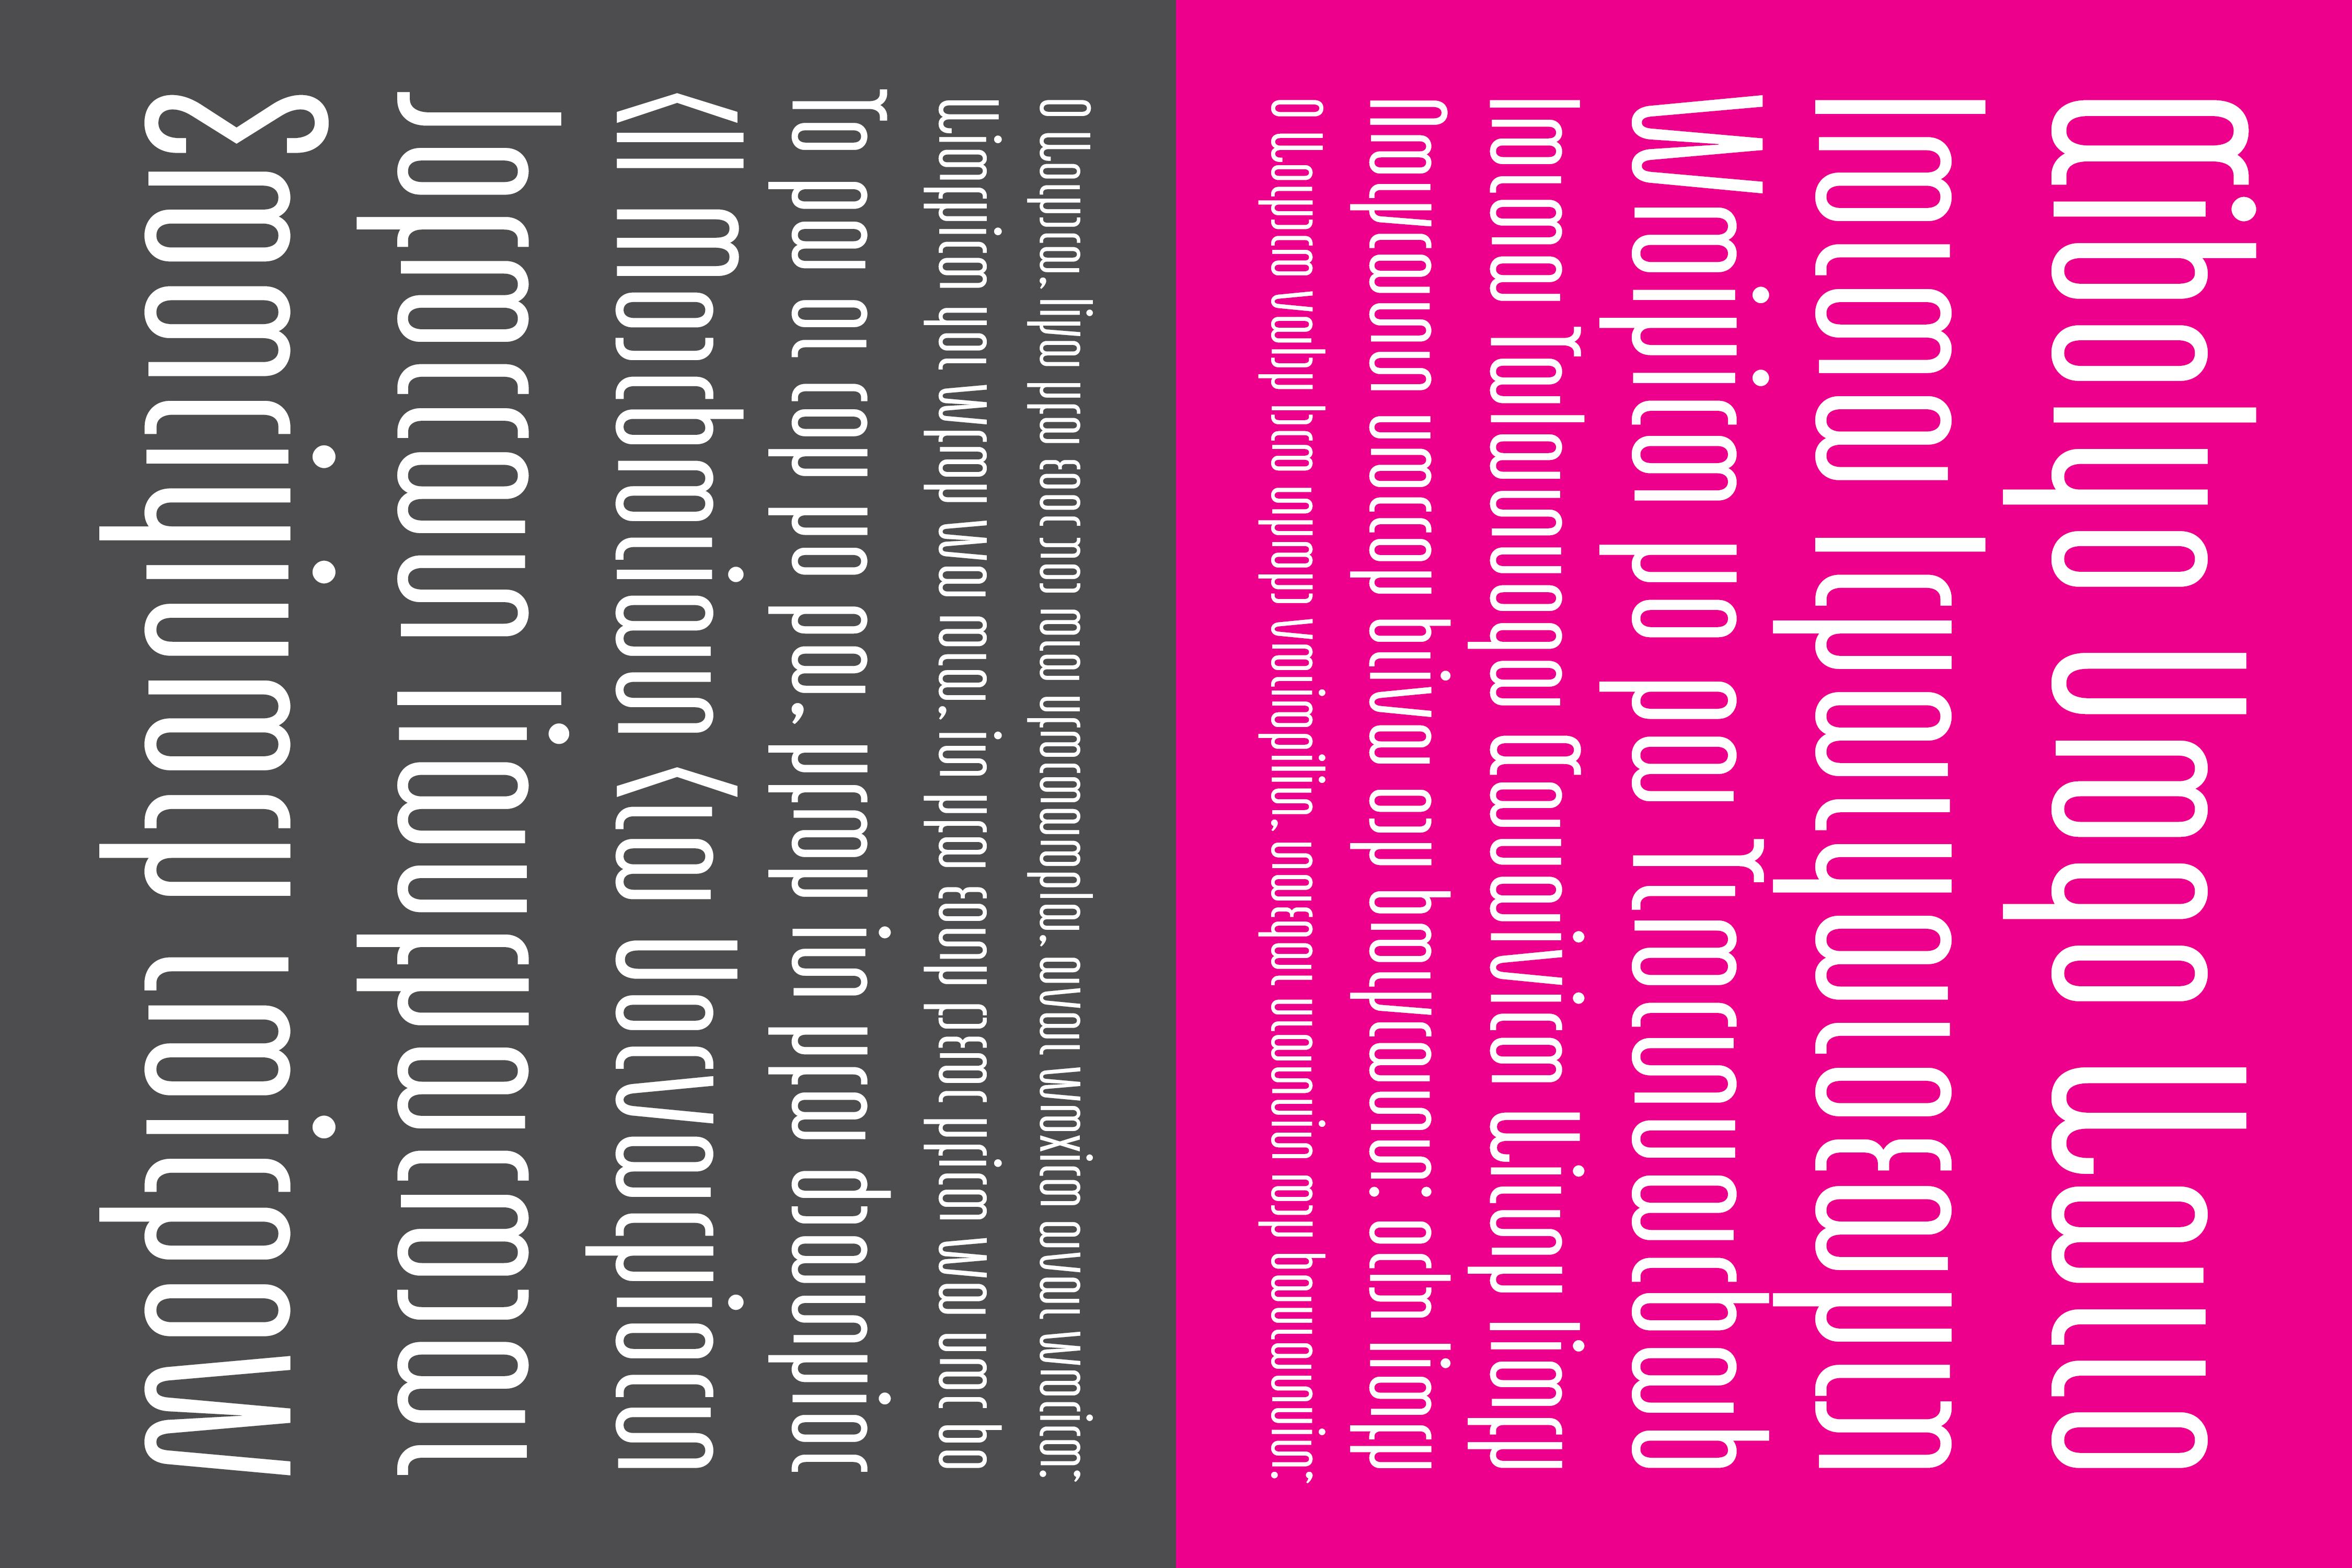 Neon Experimental Typeface